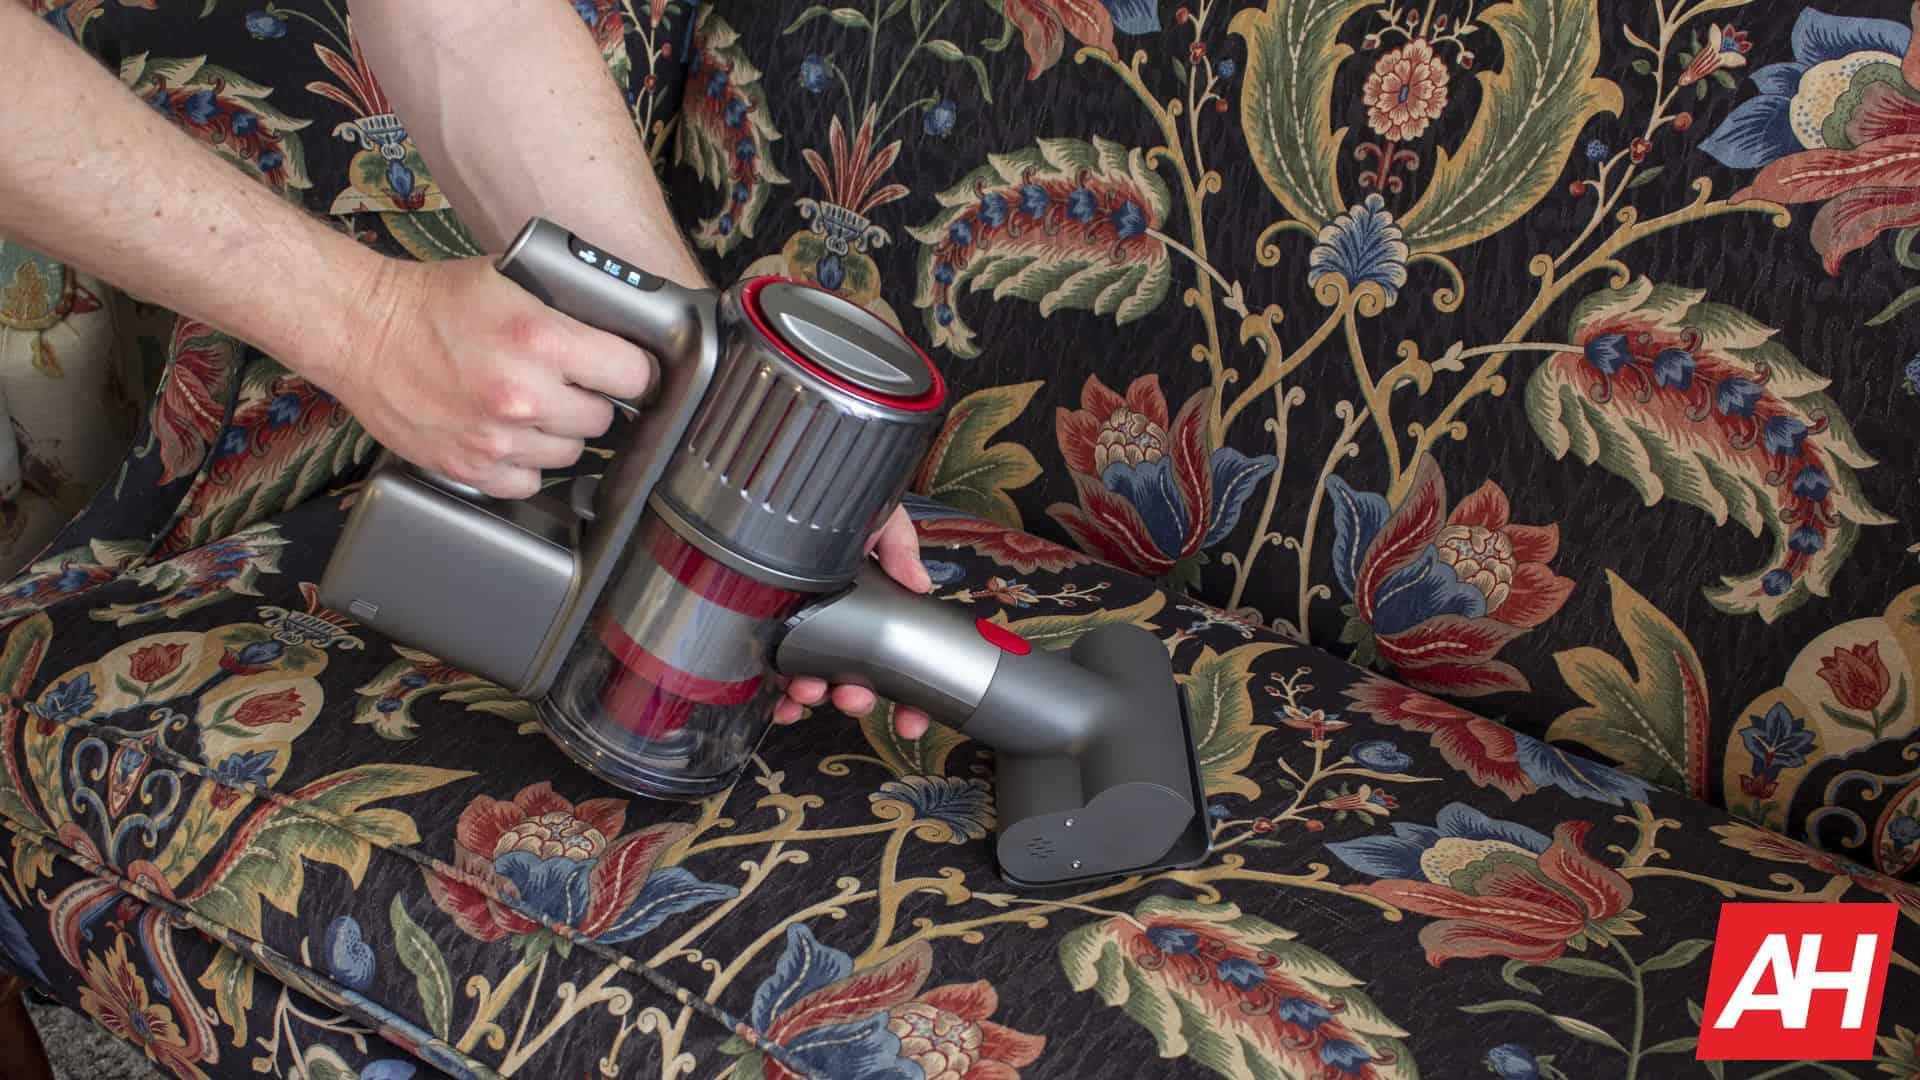 Roborock H6 AH 2020 vacuuming couch